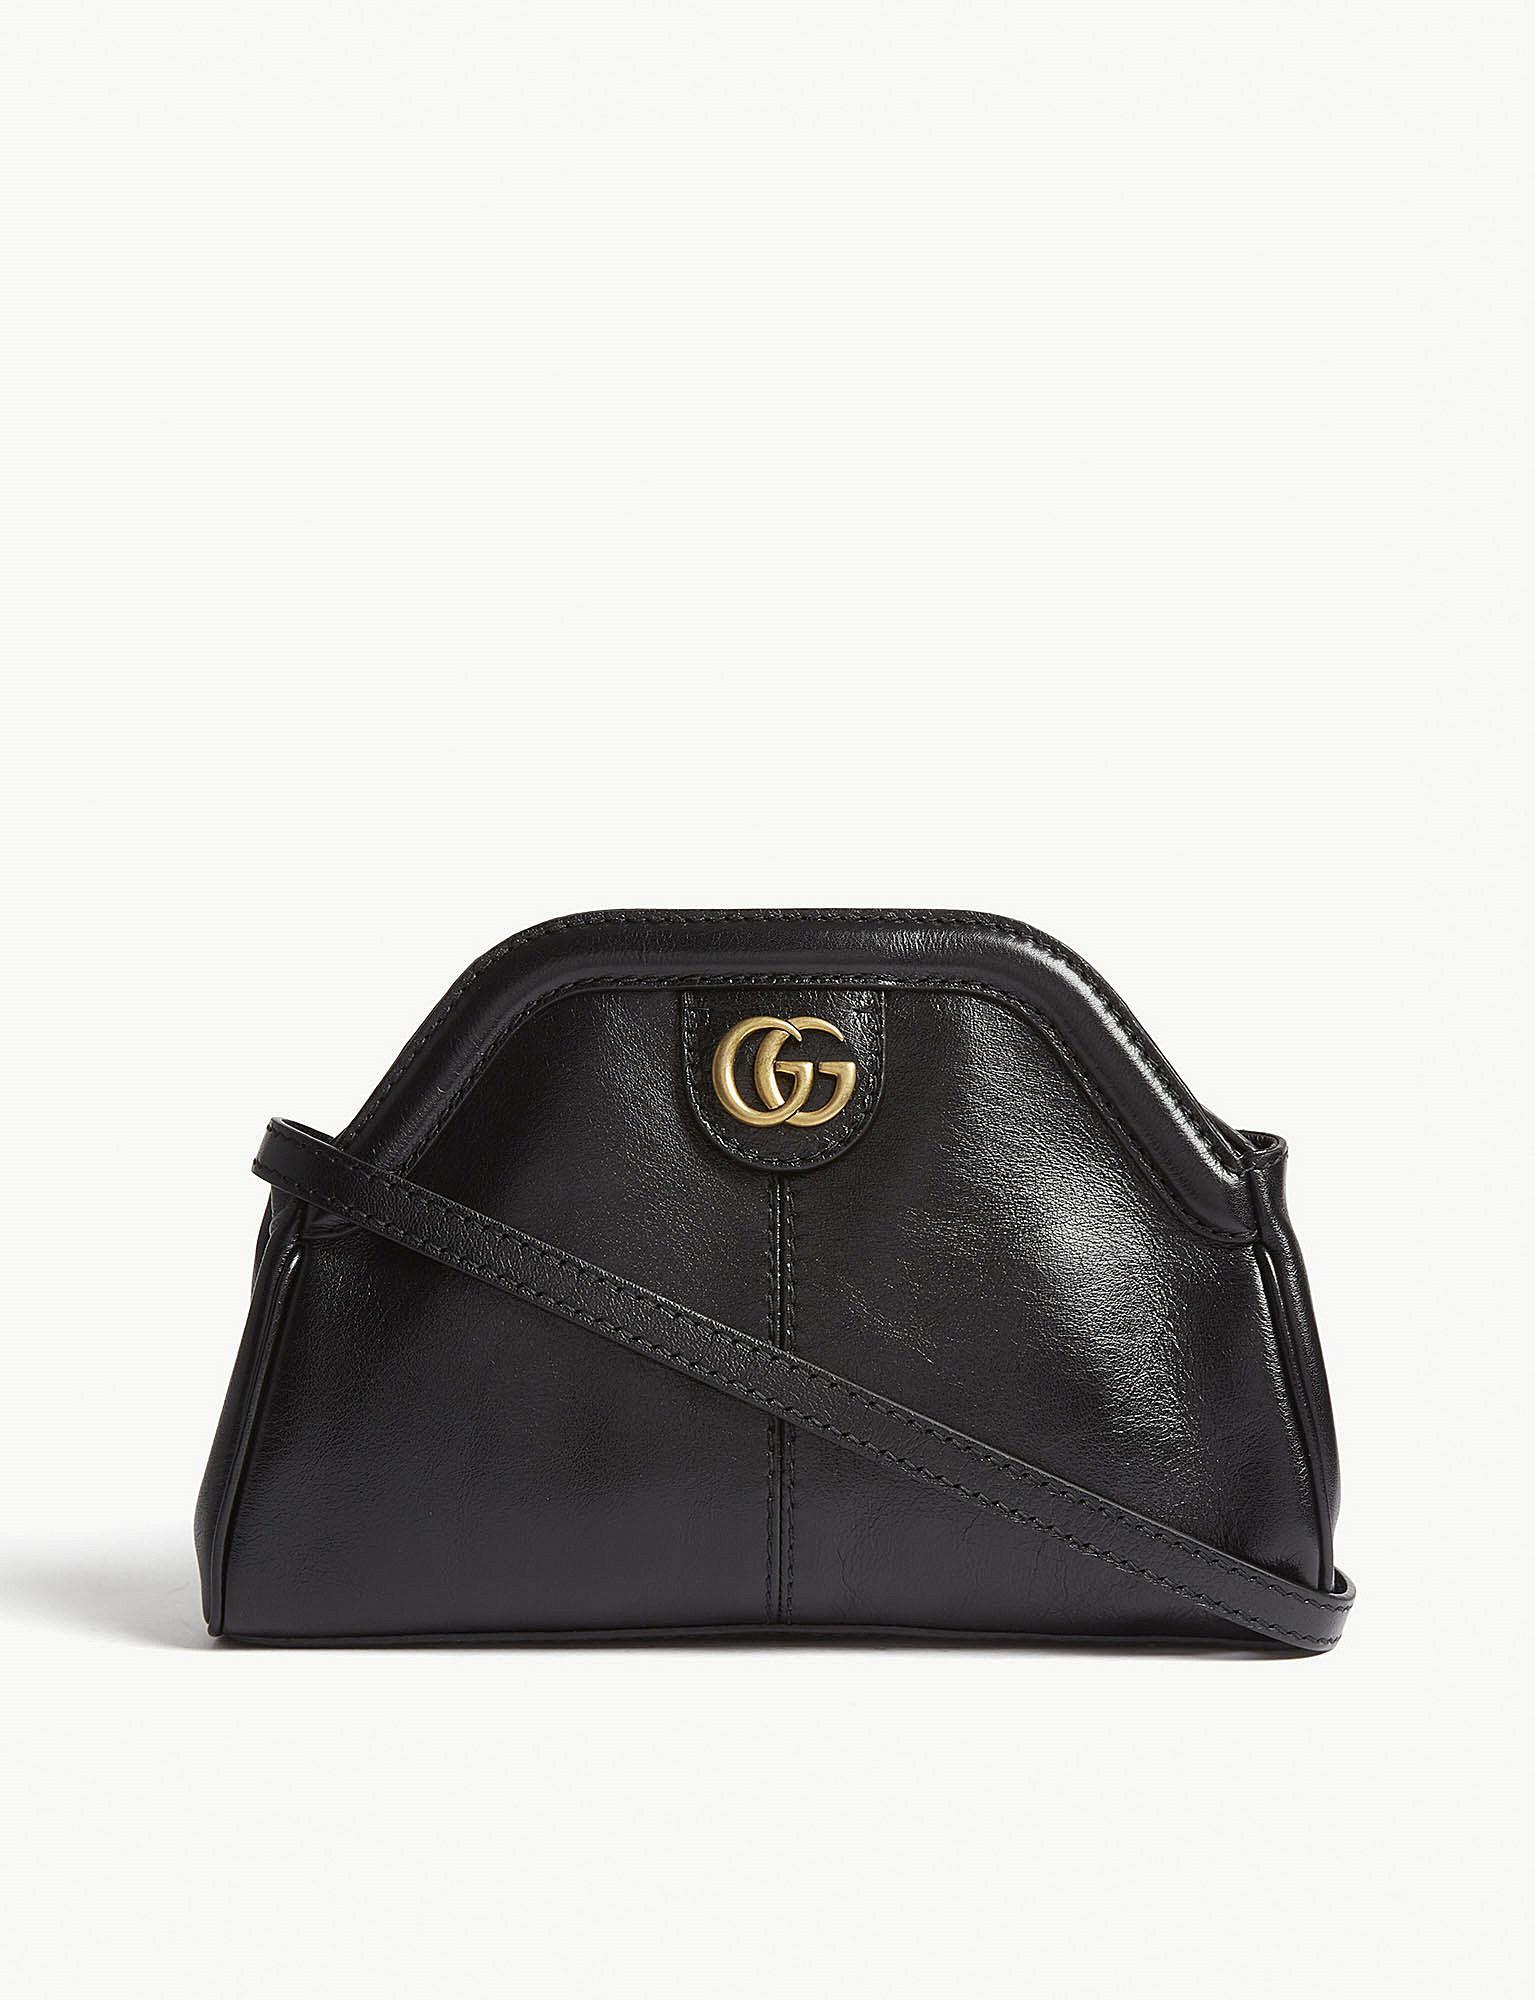 Lyst - Gucci Ladies Black Linea Leather Shoulder Bag in Black ca42e3f7b9